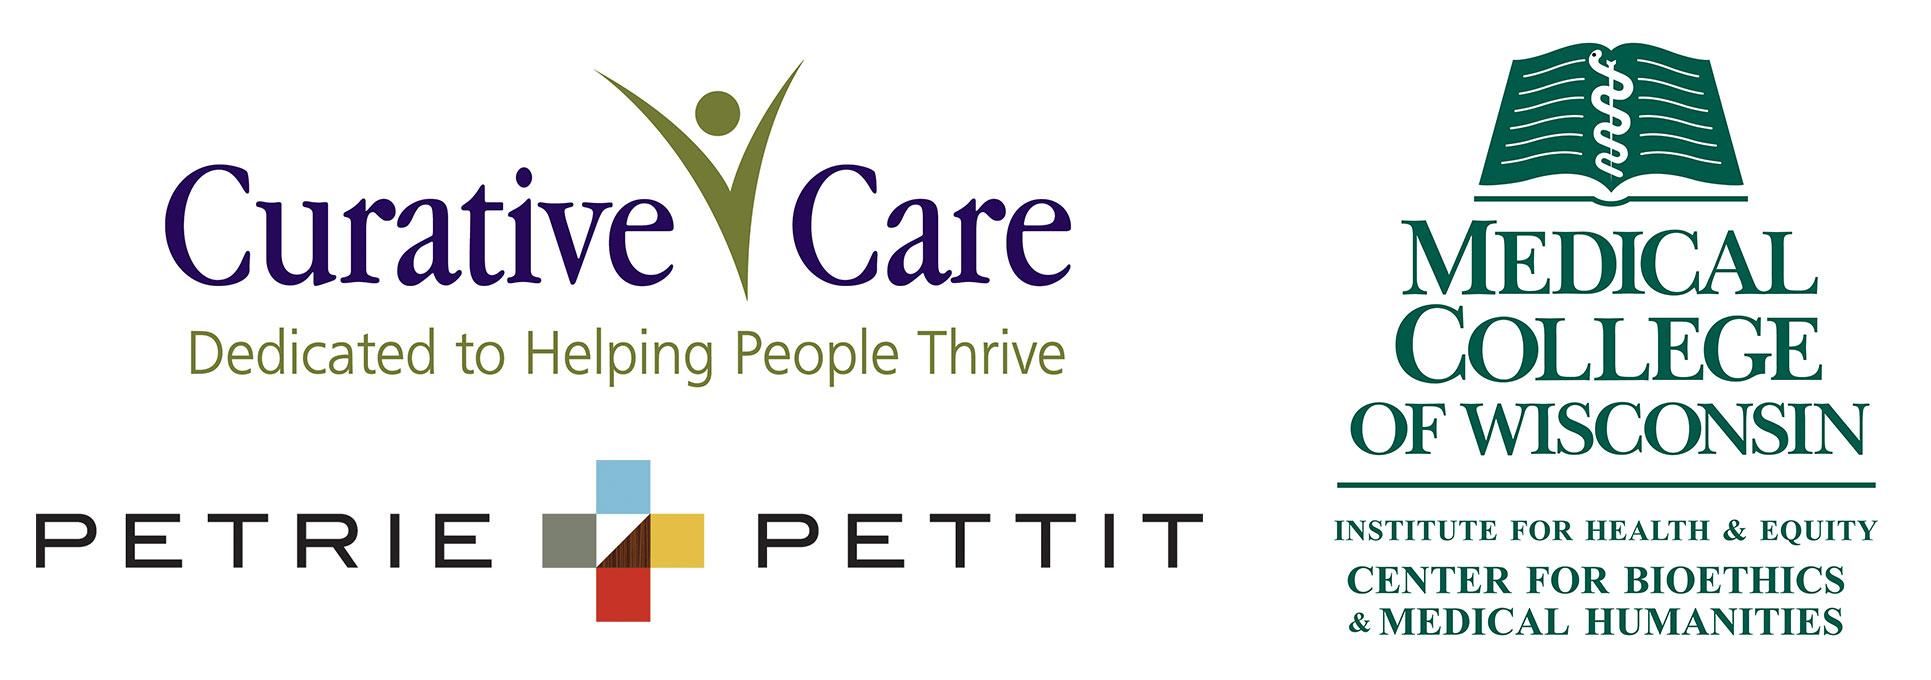 Presenter Logos - Curative Care, Petrie + Pettit, Medical College of Wisconsin